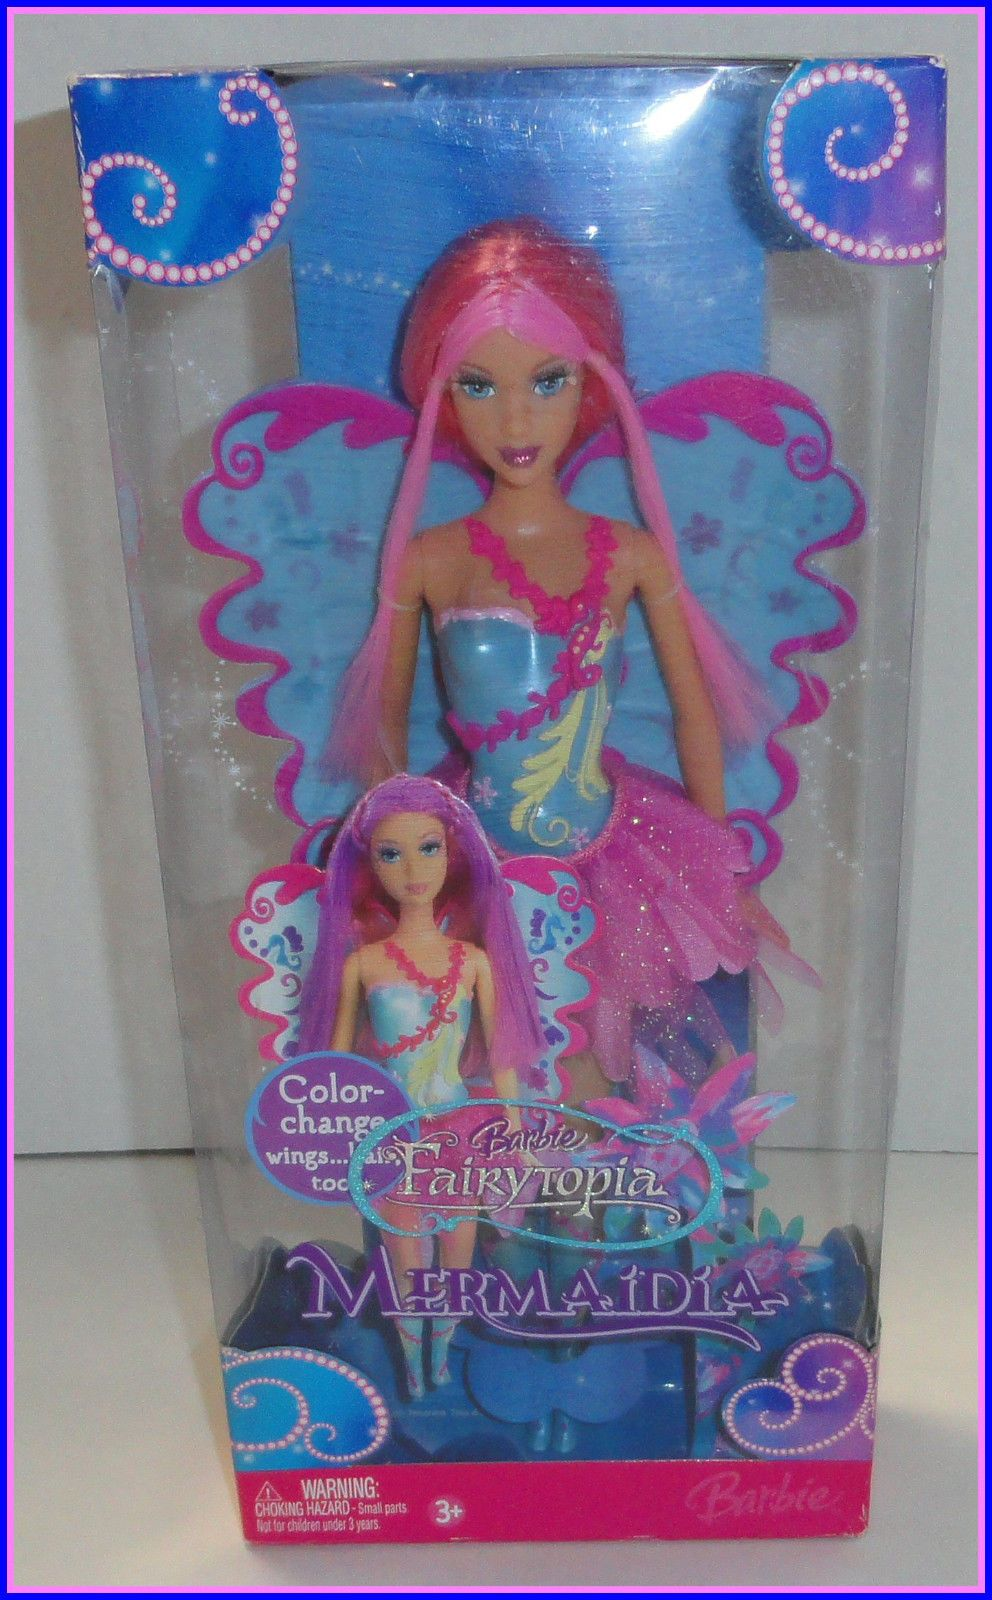 Barbie Fairytopia Mermaidia Color Change Pink Hair Fairy 11 Inch